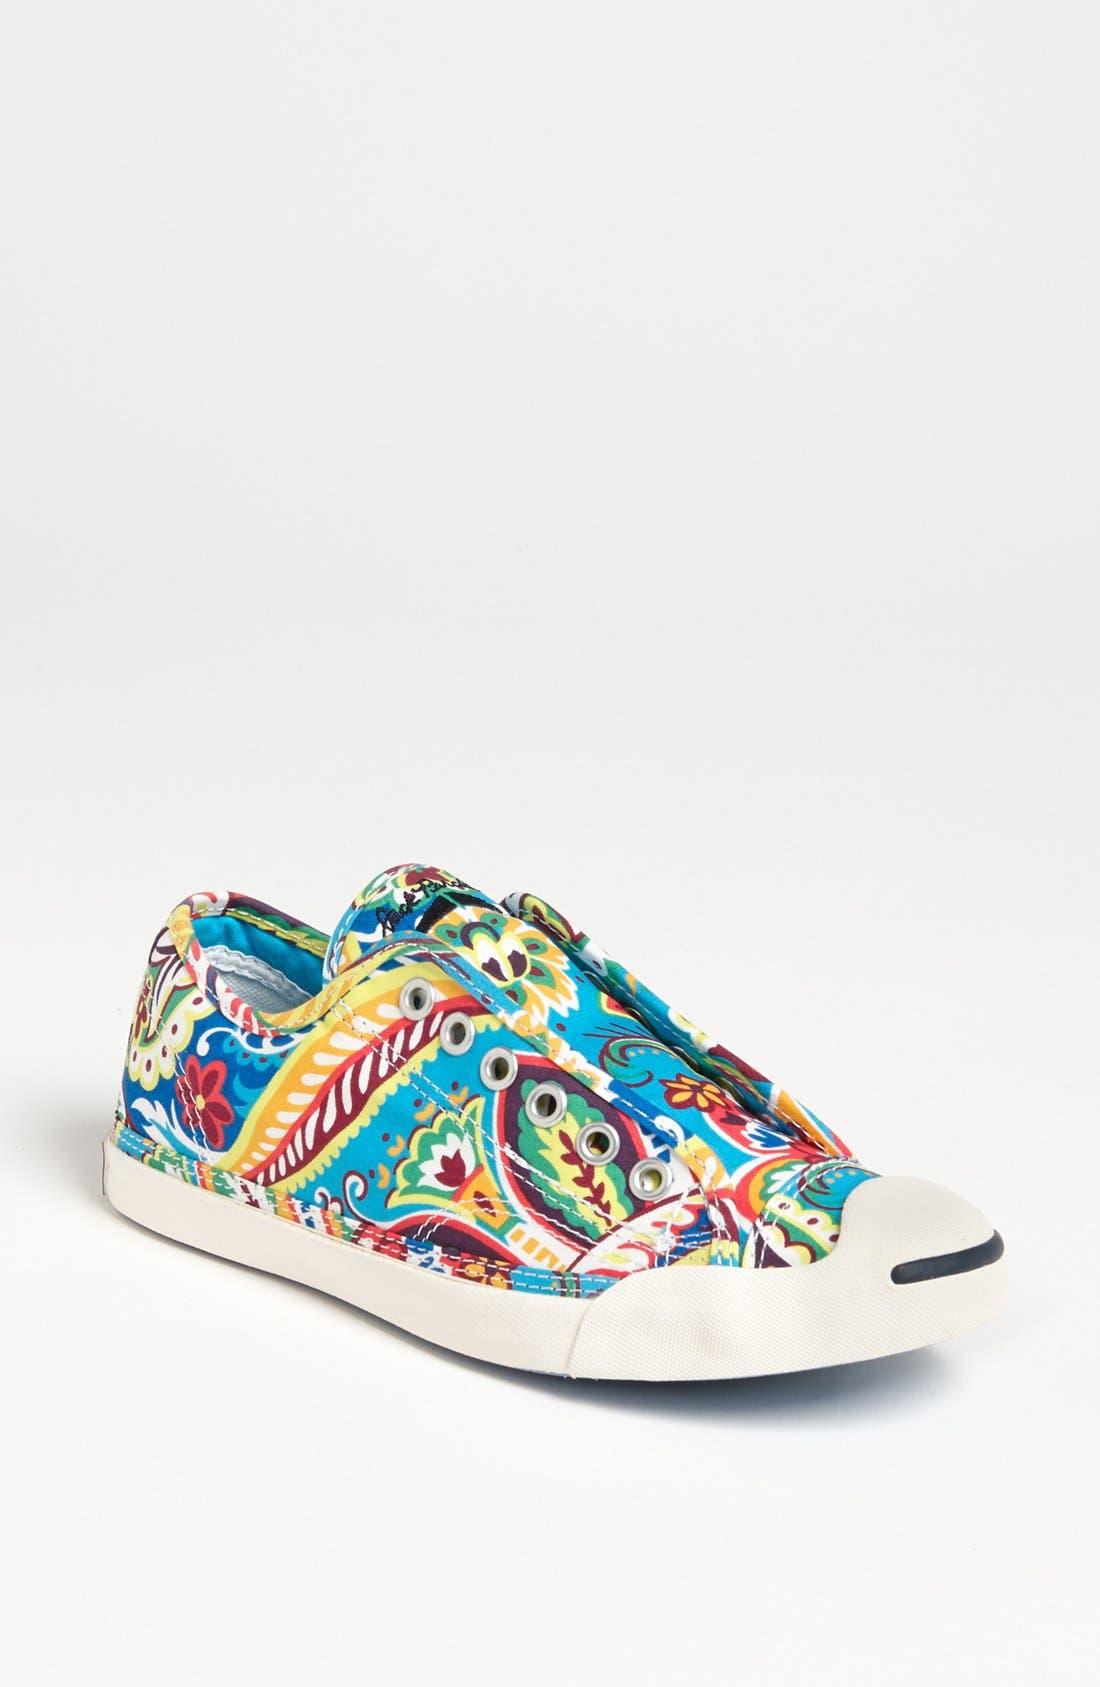 Main Image - Converse 'Jack Purcell LP' Slip-On Sneaker (Women)